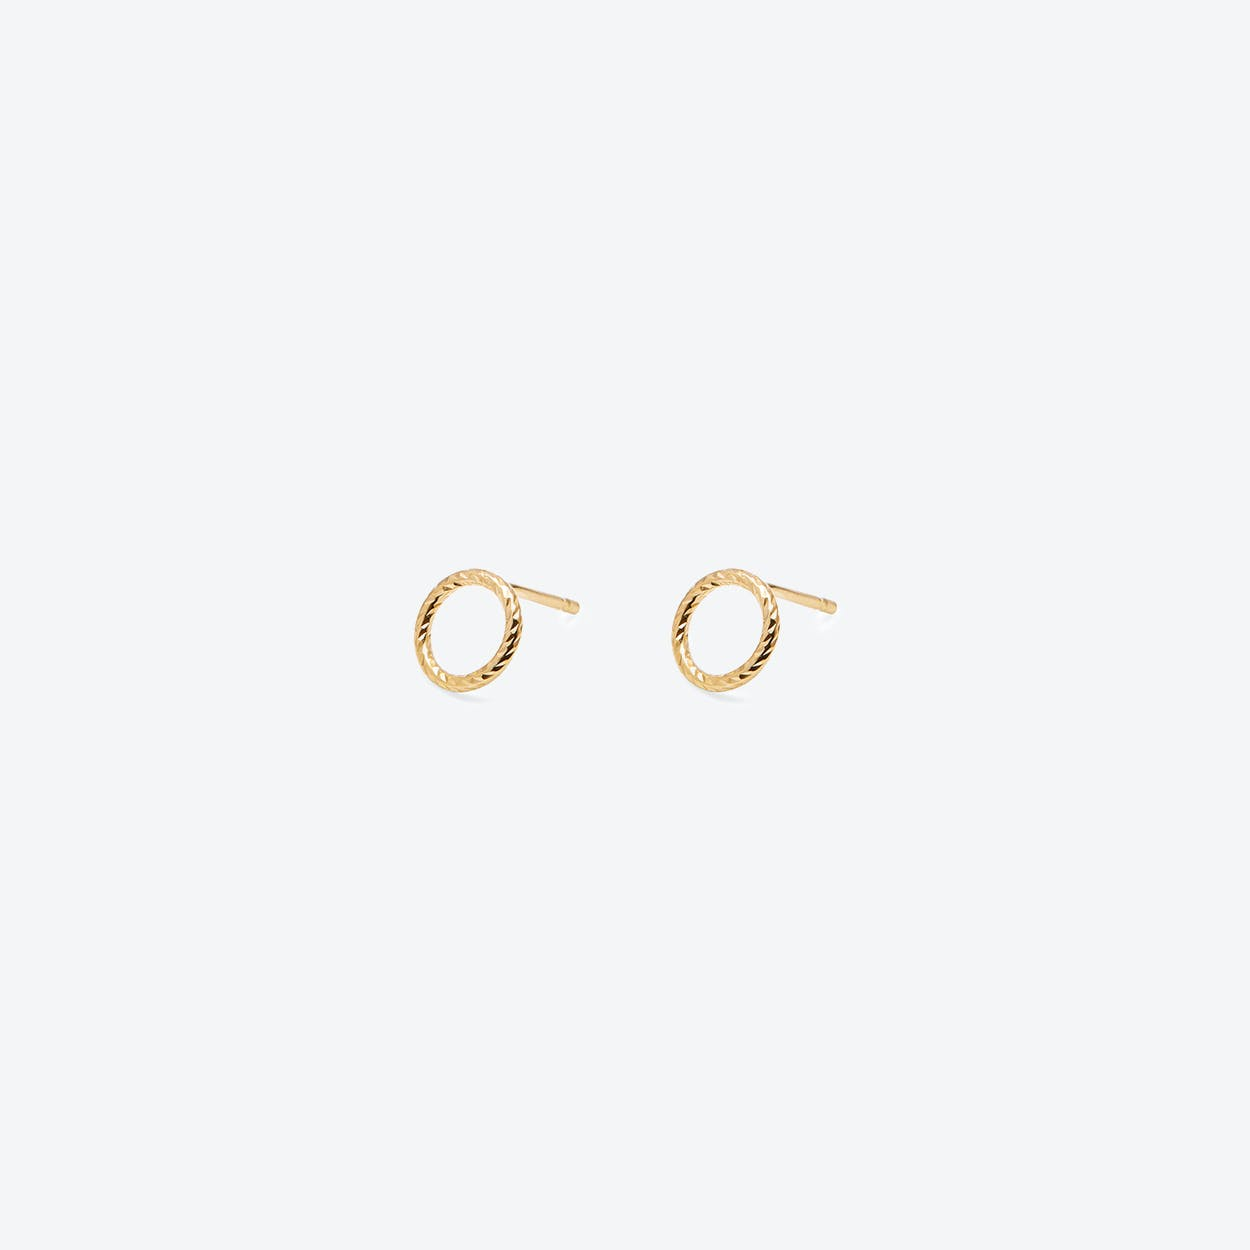 Mini Circle Diamond Stud Earrings Gold Plated